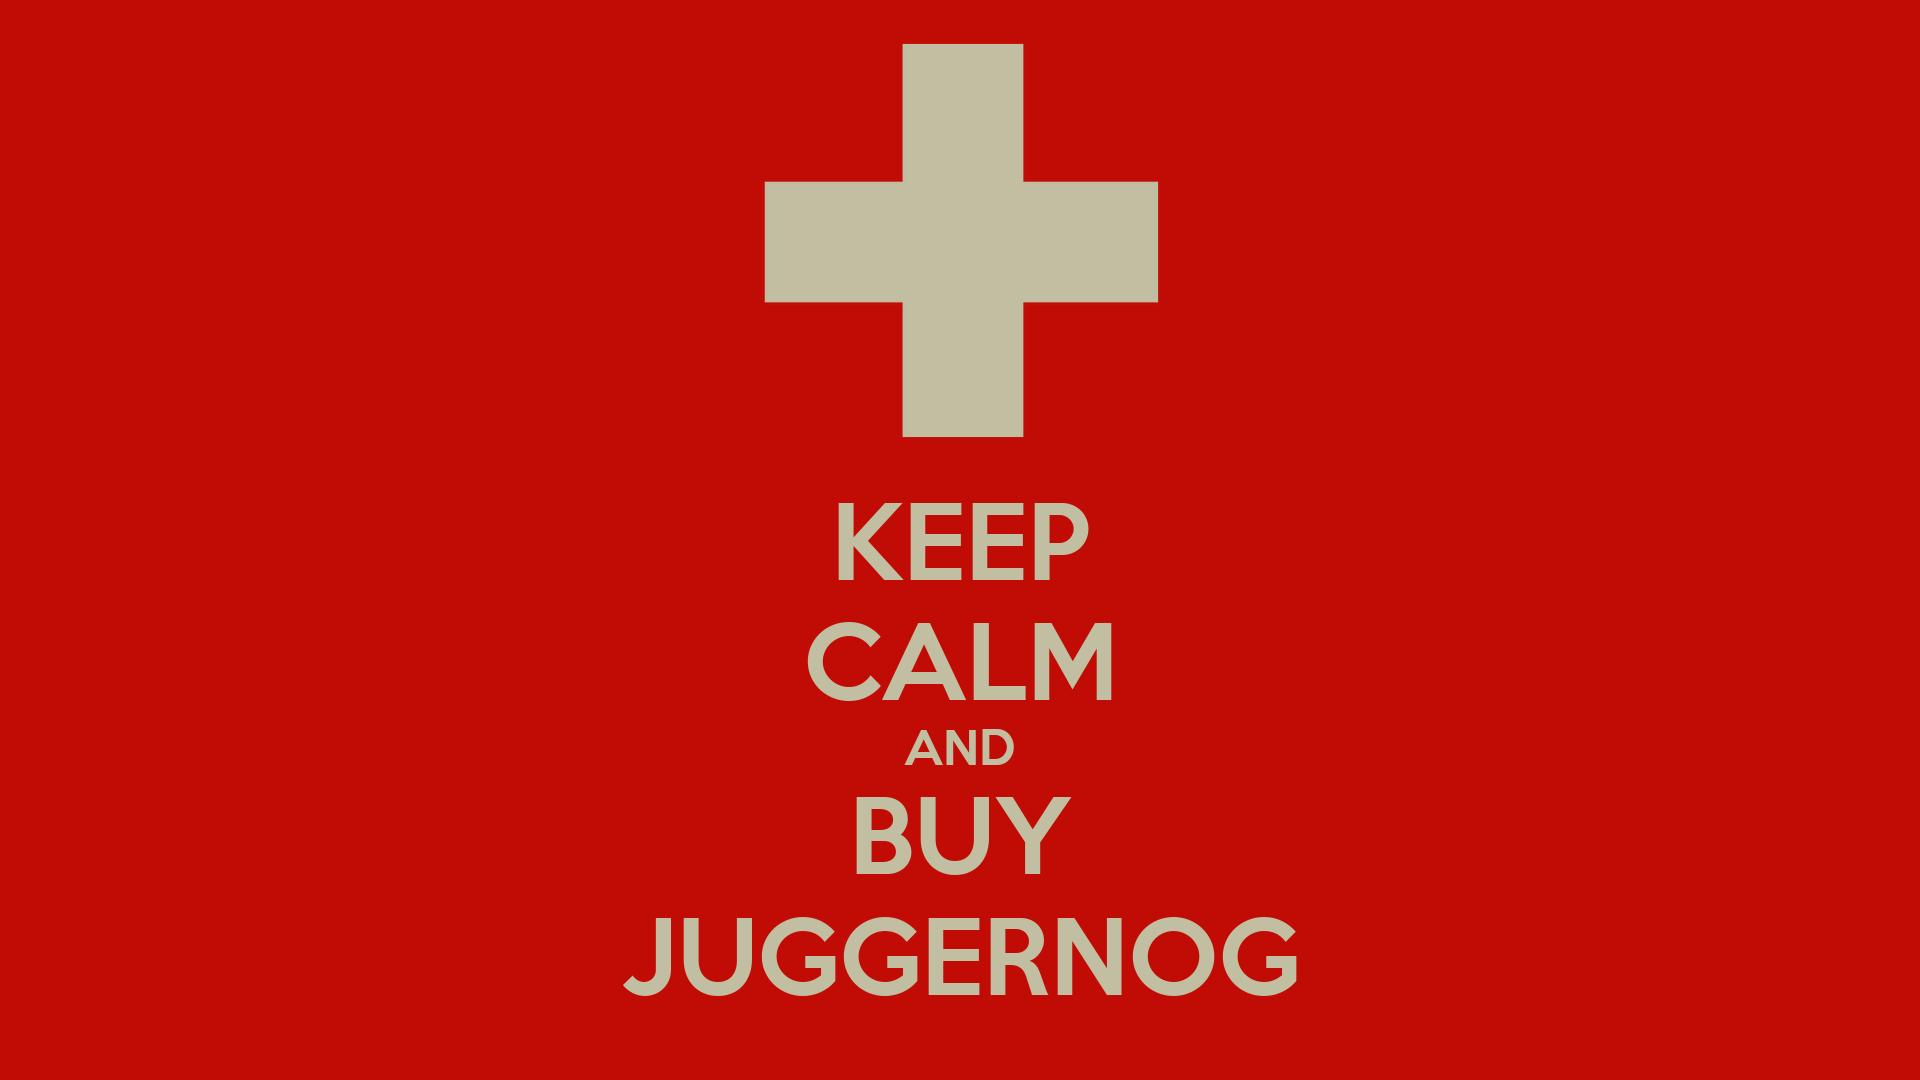 Juggernog Wallpaper Iphone Keep Calm And Buy Juggernog Keep Calm And Carry On Image